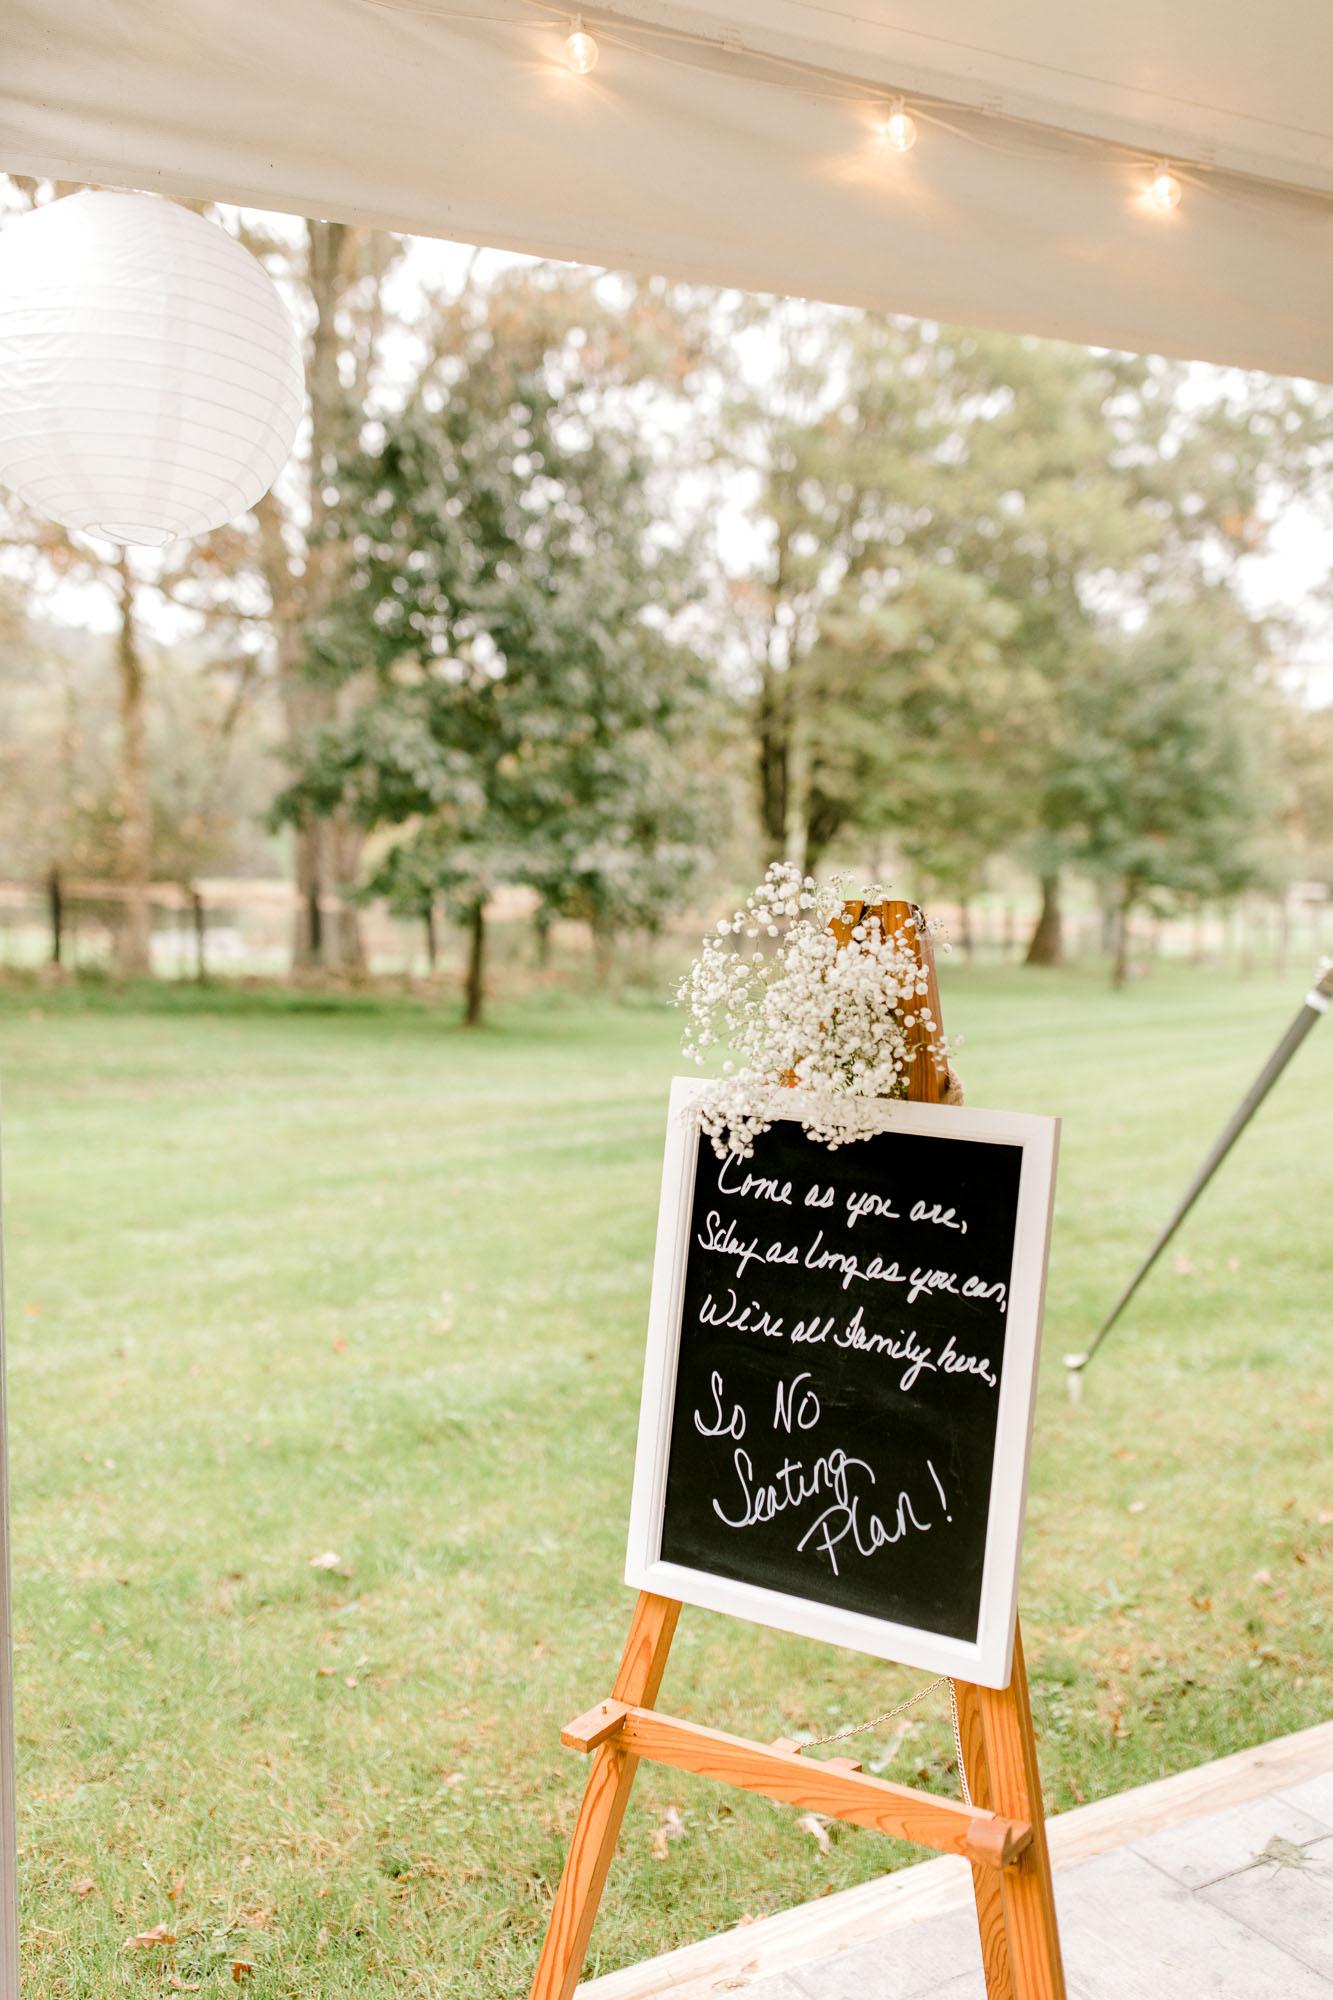 Lodge-at-Raven-Creek-October-wedding-19.jpg